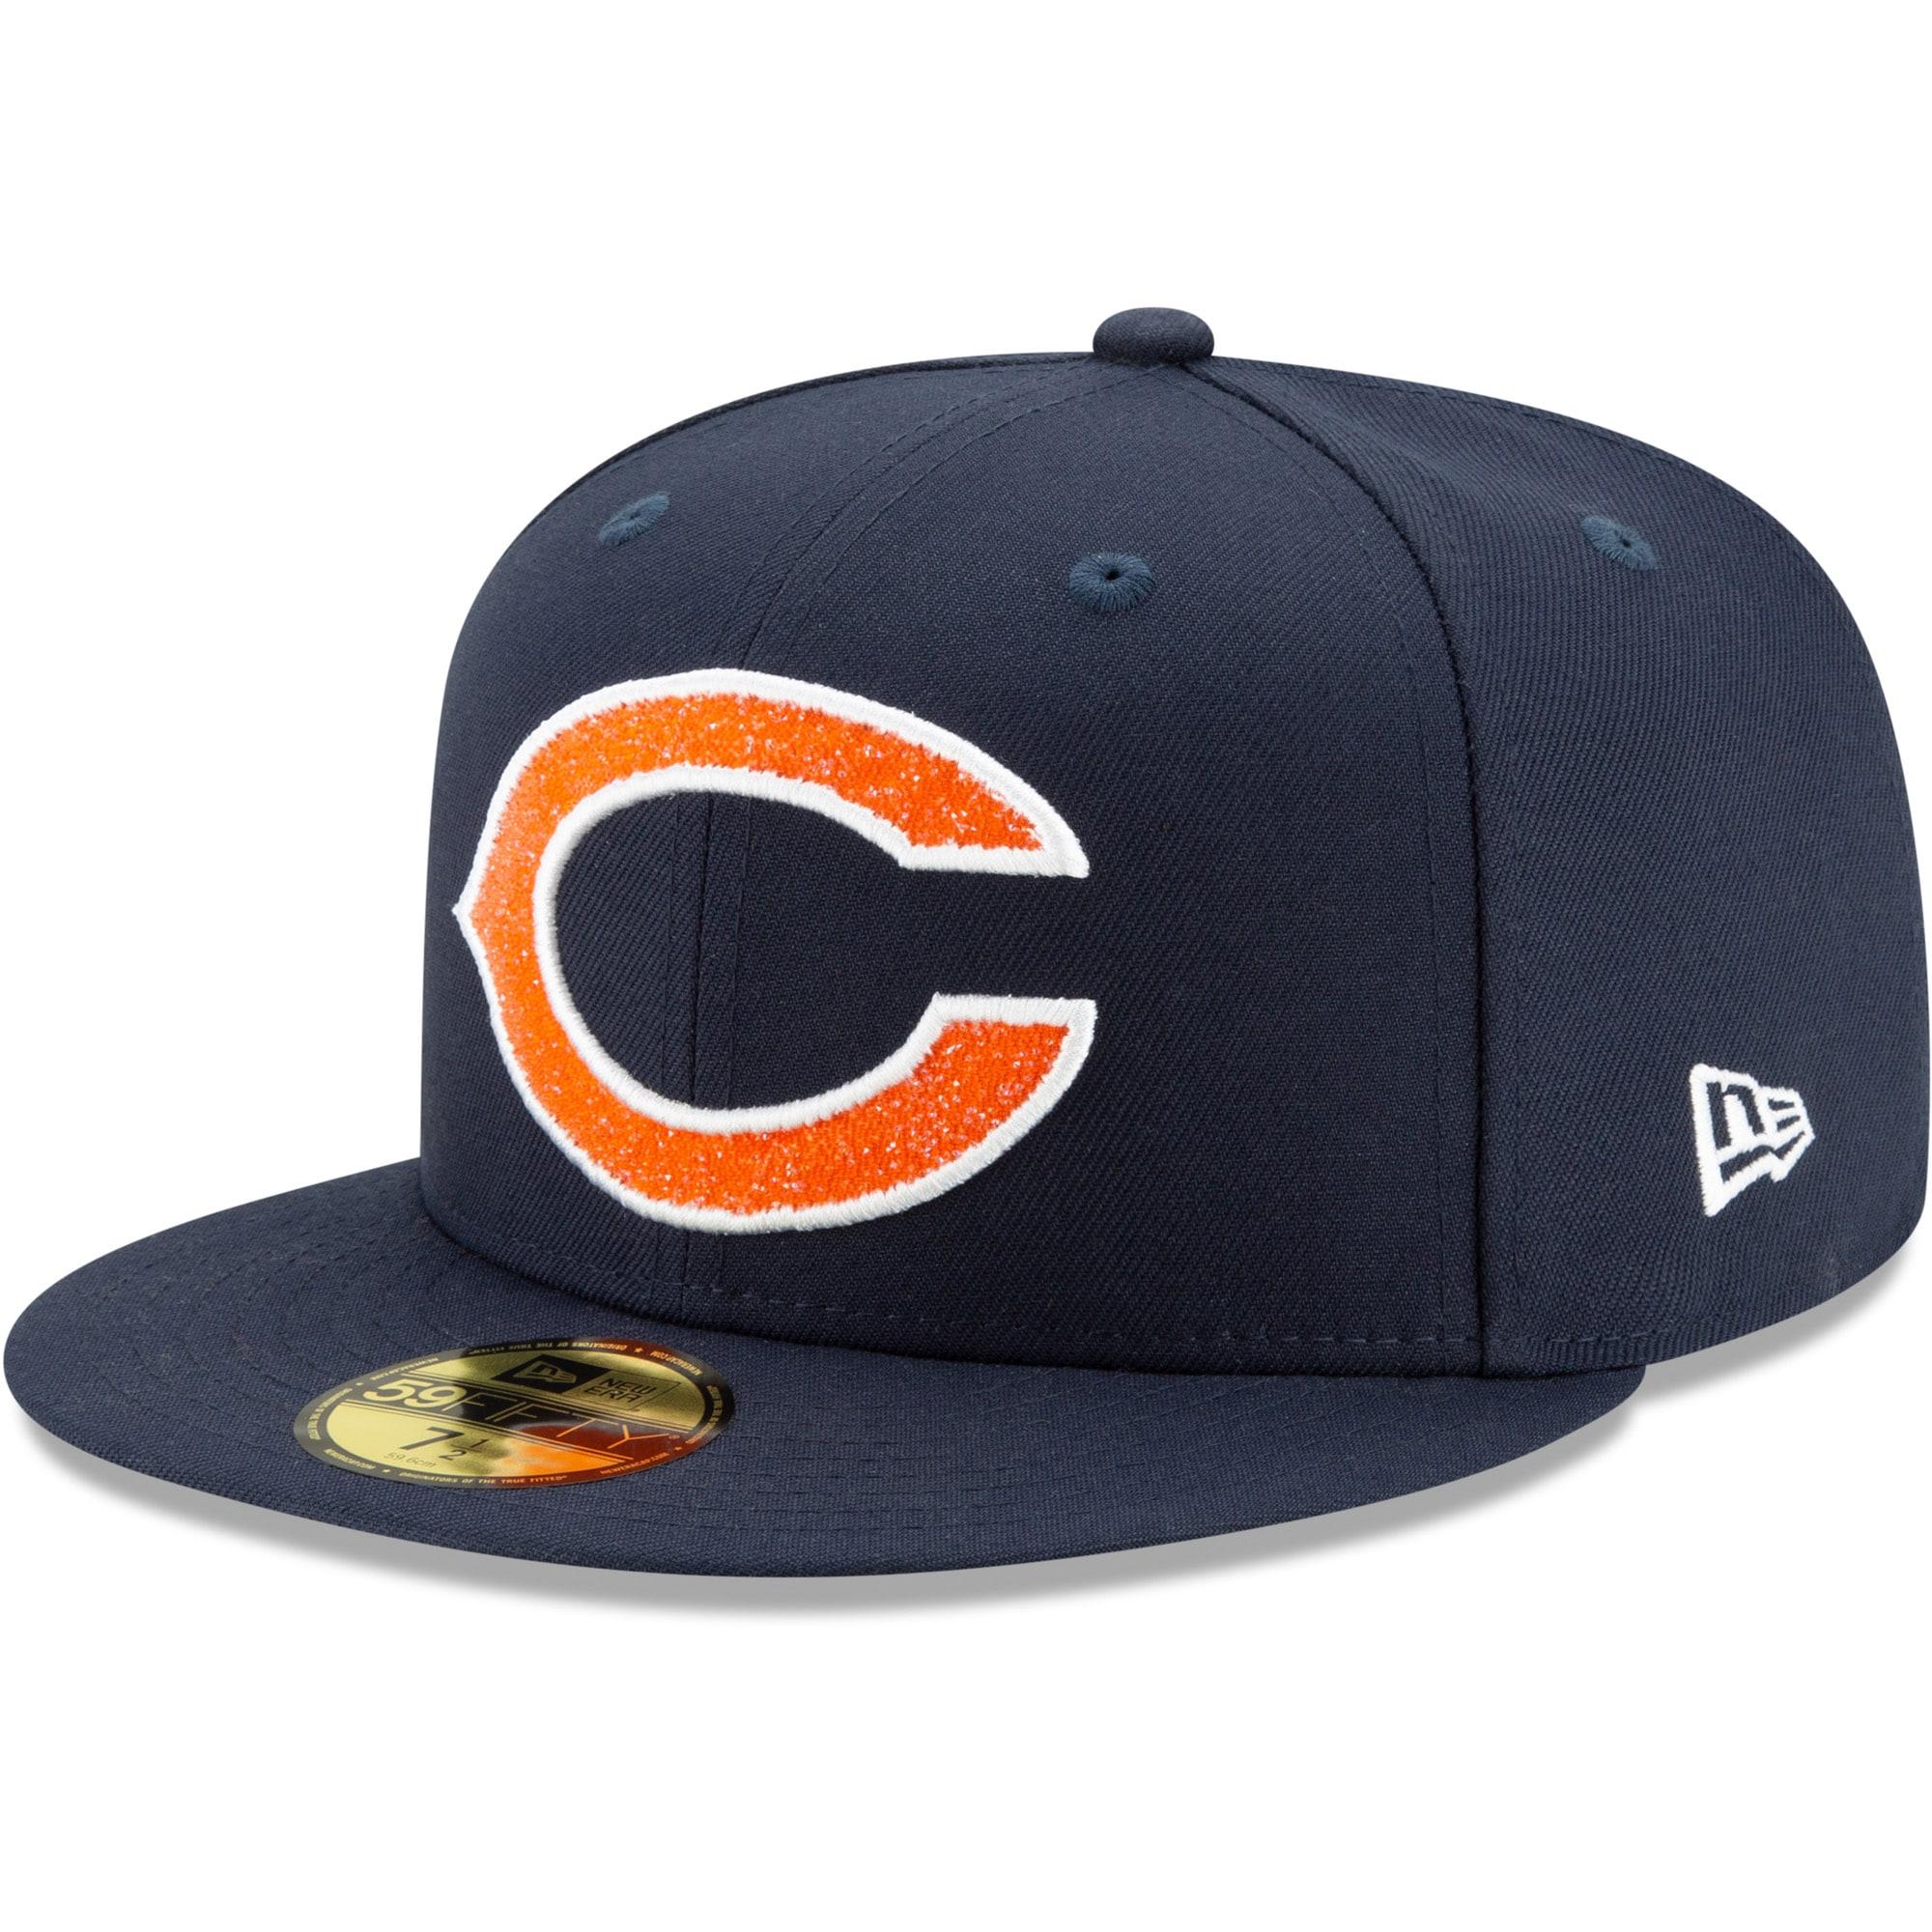 Chicago Bears New Era Swarovski 59FIFTY Fitted Hat - Navy